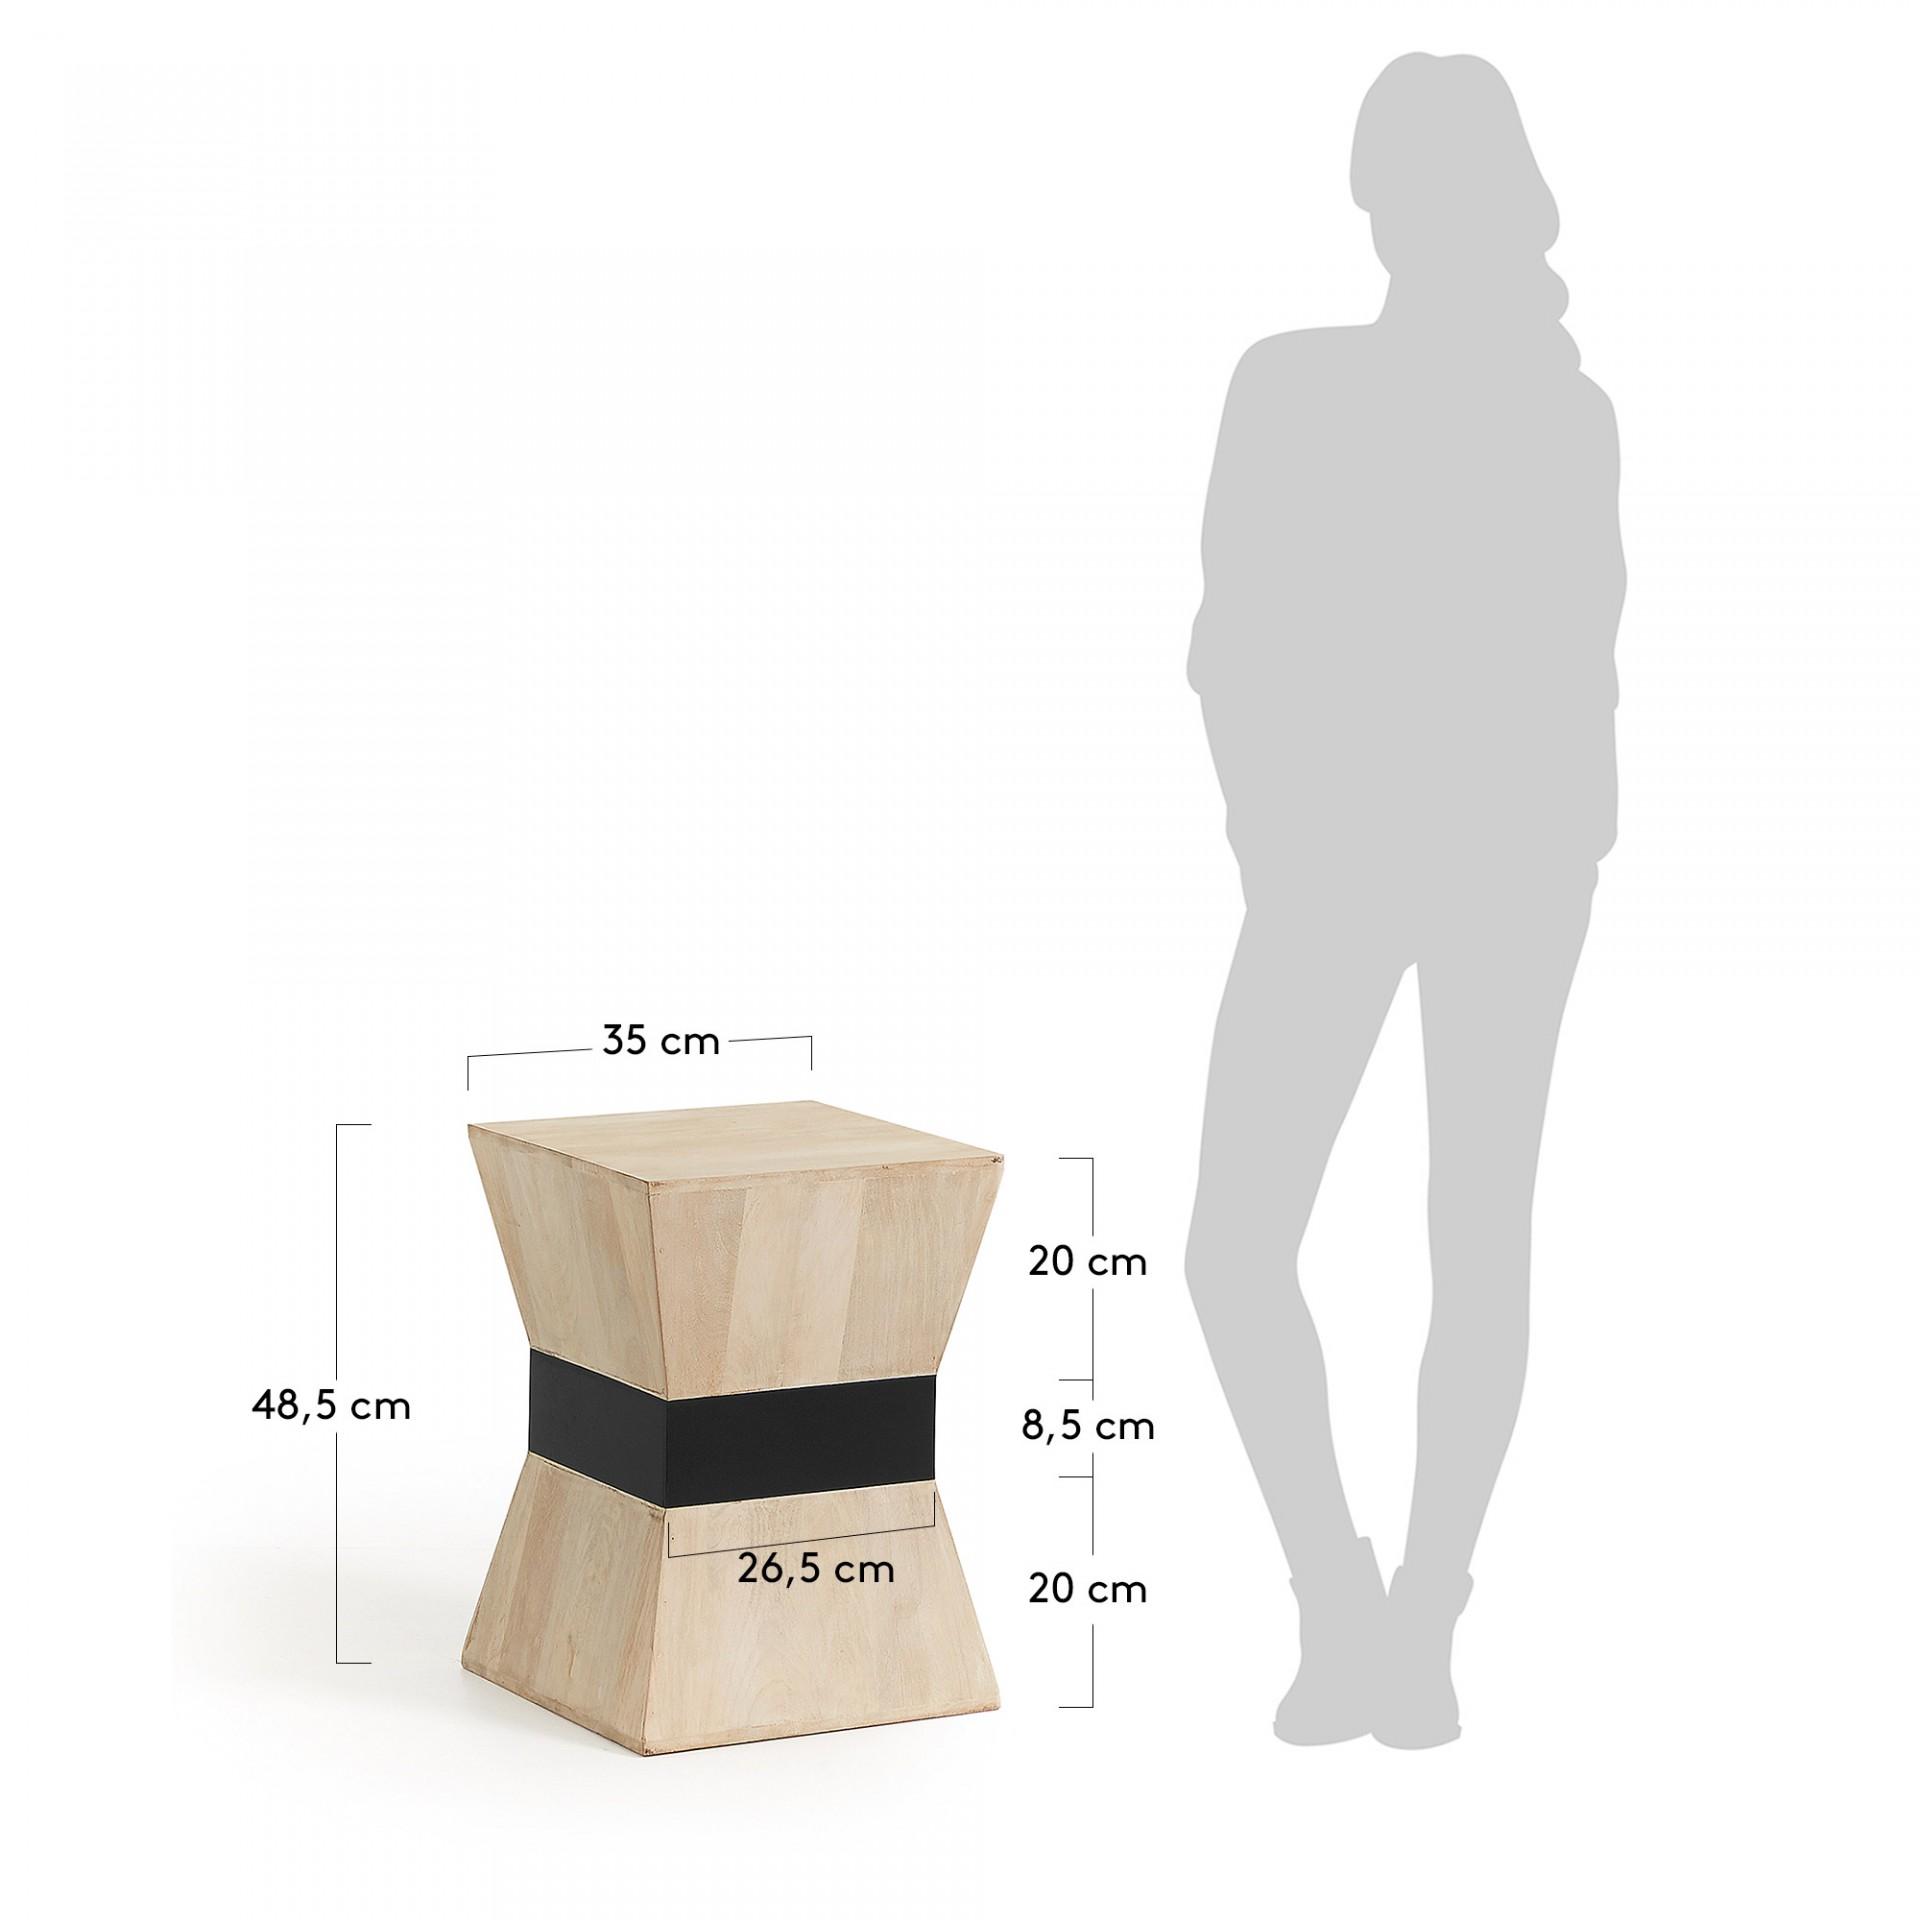 Mesa de apoio Poke, madeira manga natural, 35x35x48,5